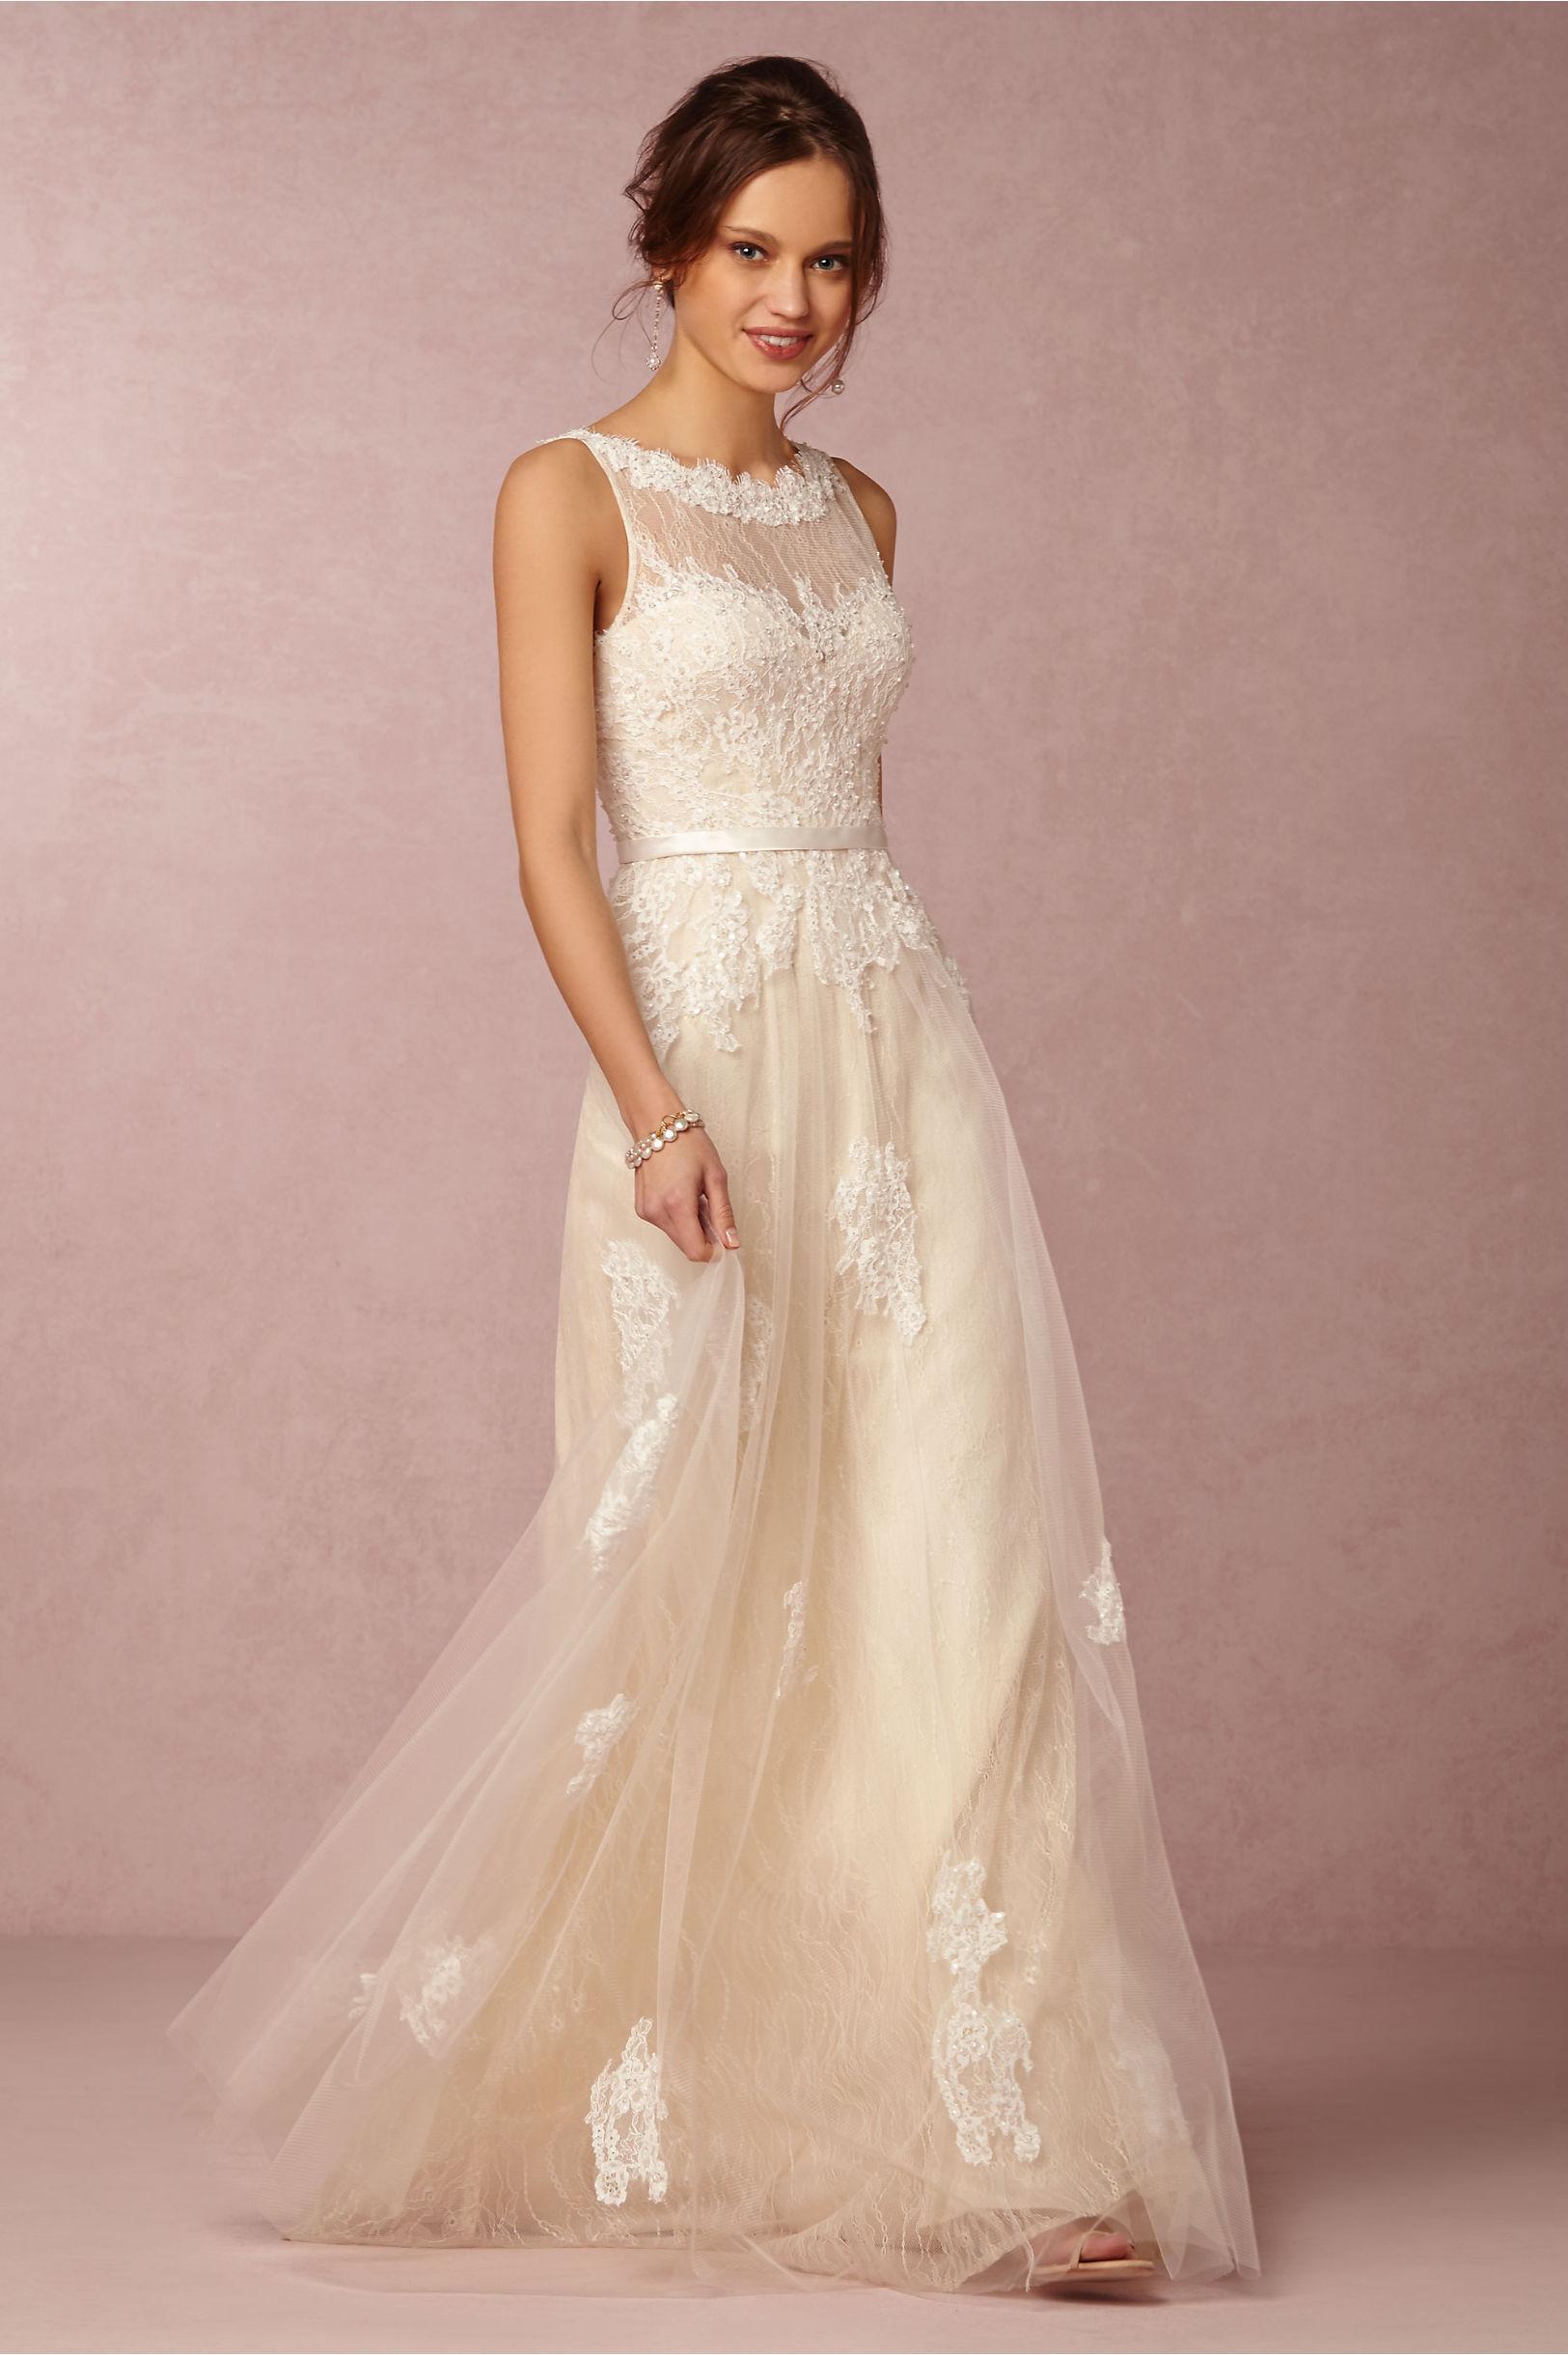 Discount bhldn 2016 ivory wedding dresses high neck for Dhgate wedding dresses 2016